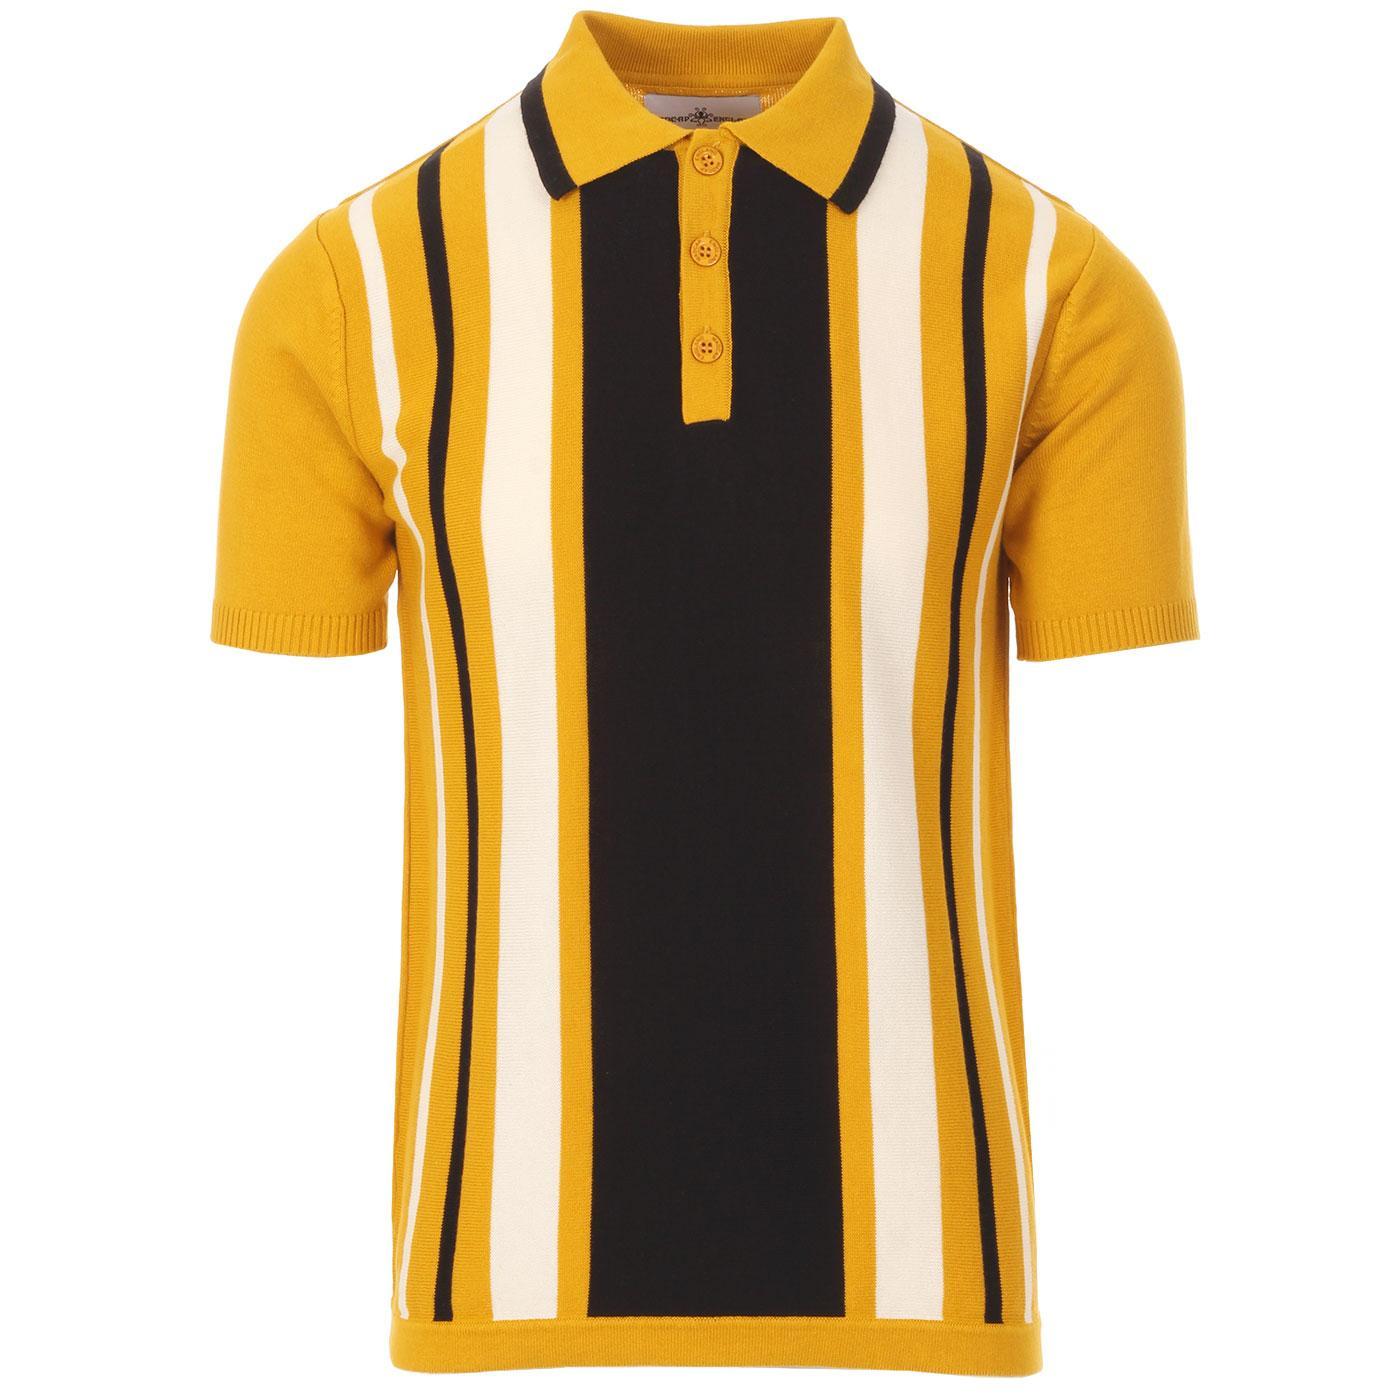 Folklore MADCAP ENGLAND Mod Stripe Knit Polo (AW)